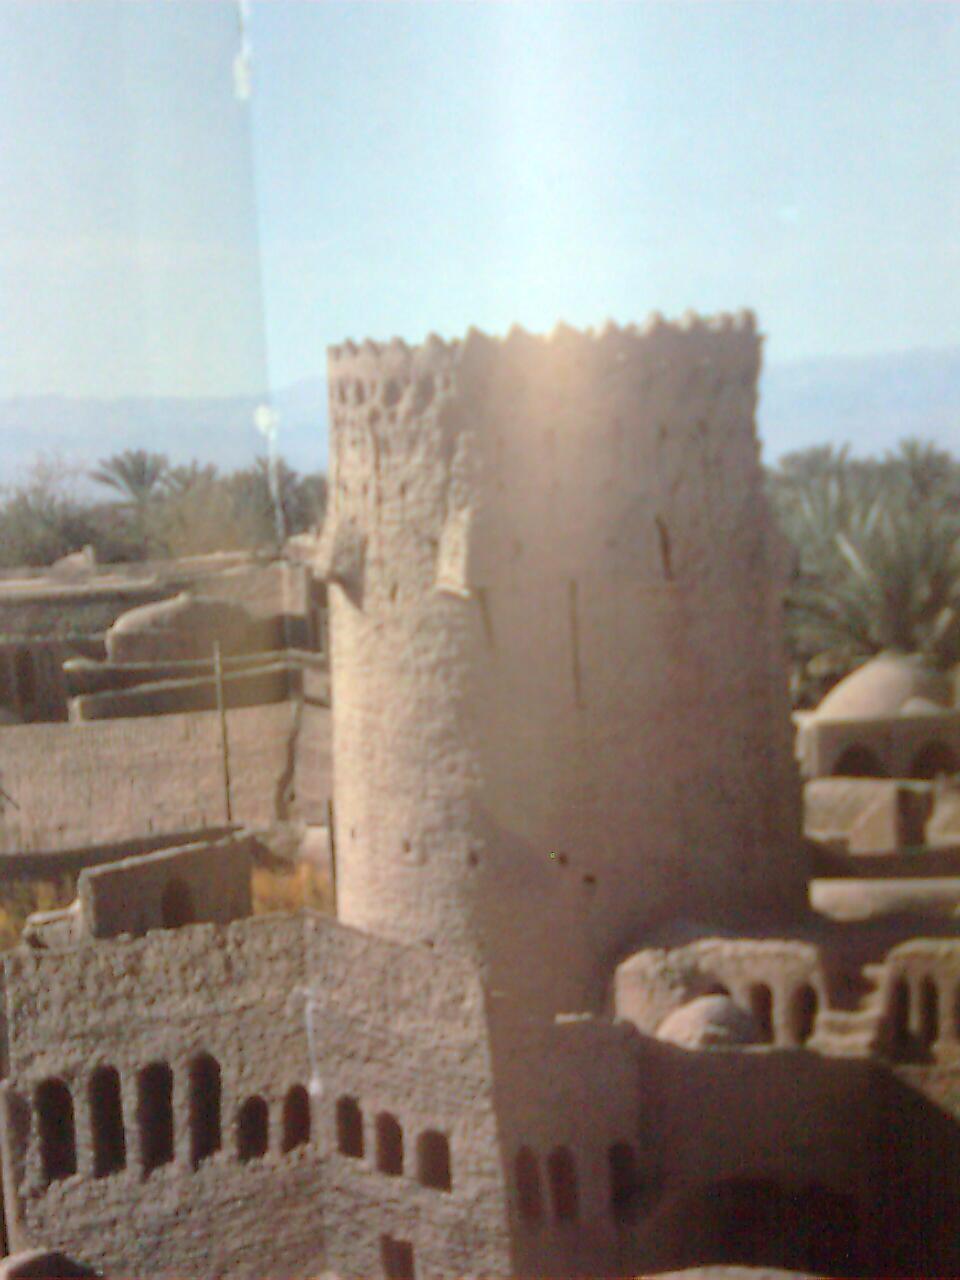 سد کریت قبل از زلزله 1357 طبس